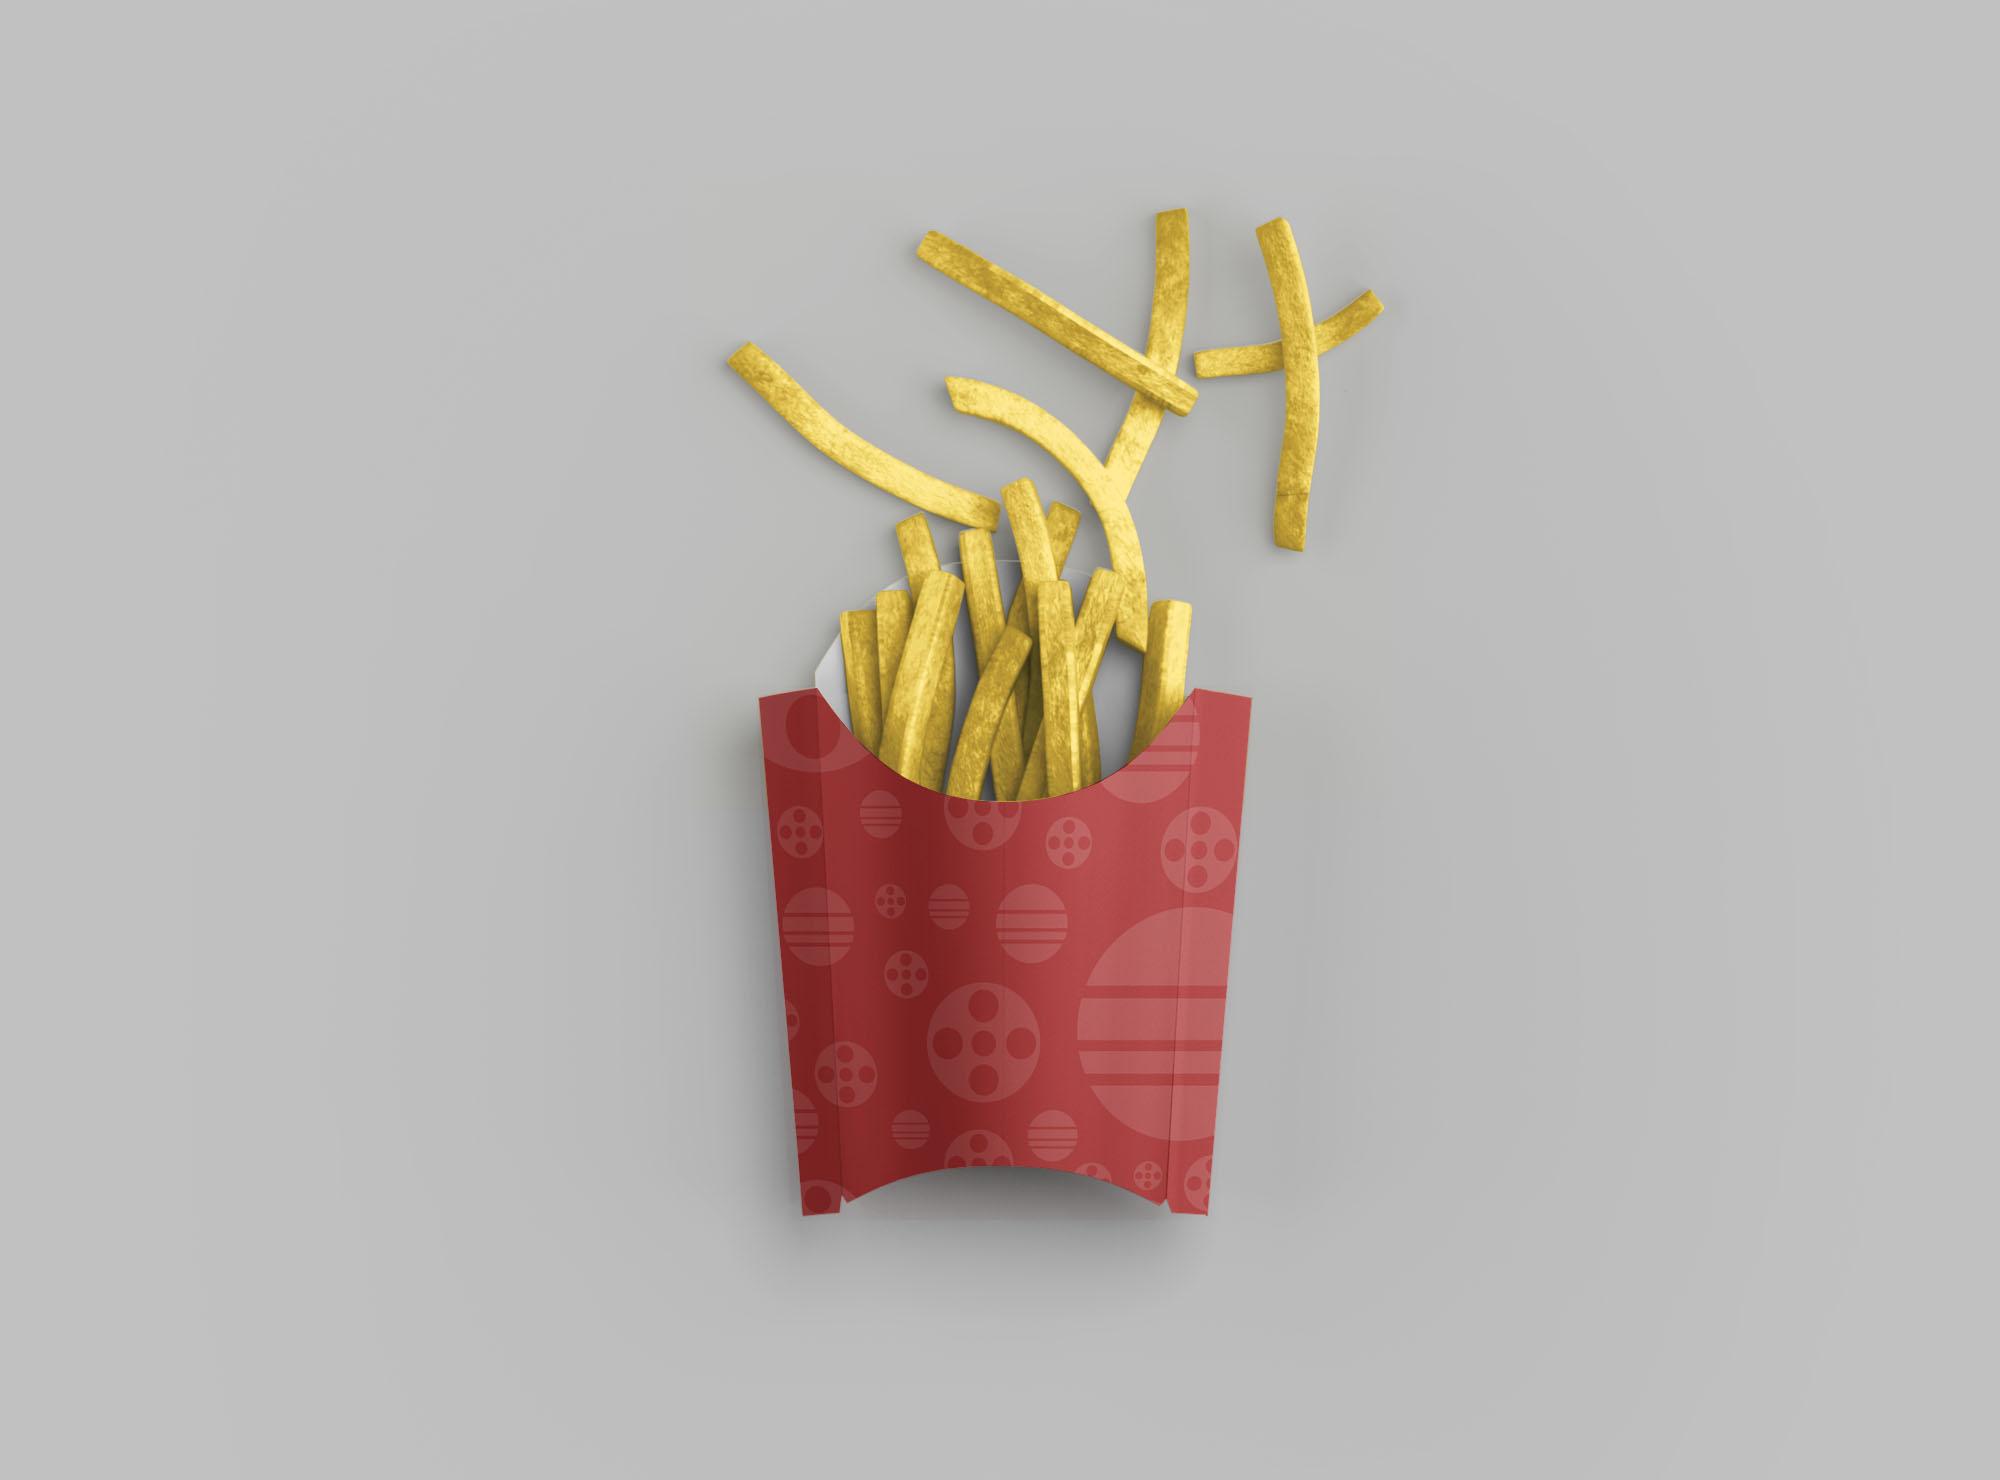 Fries Box Mockup.jpg